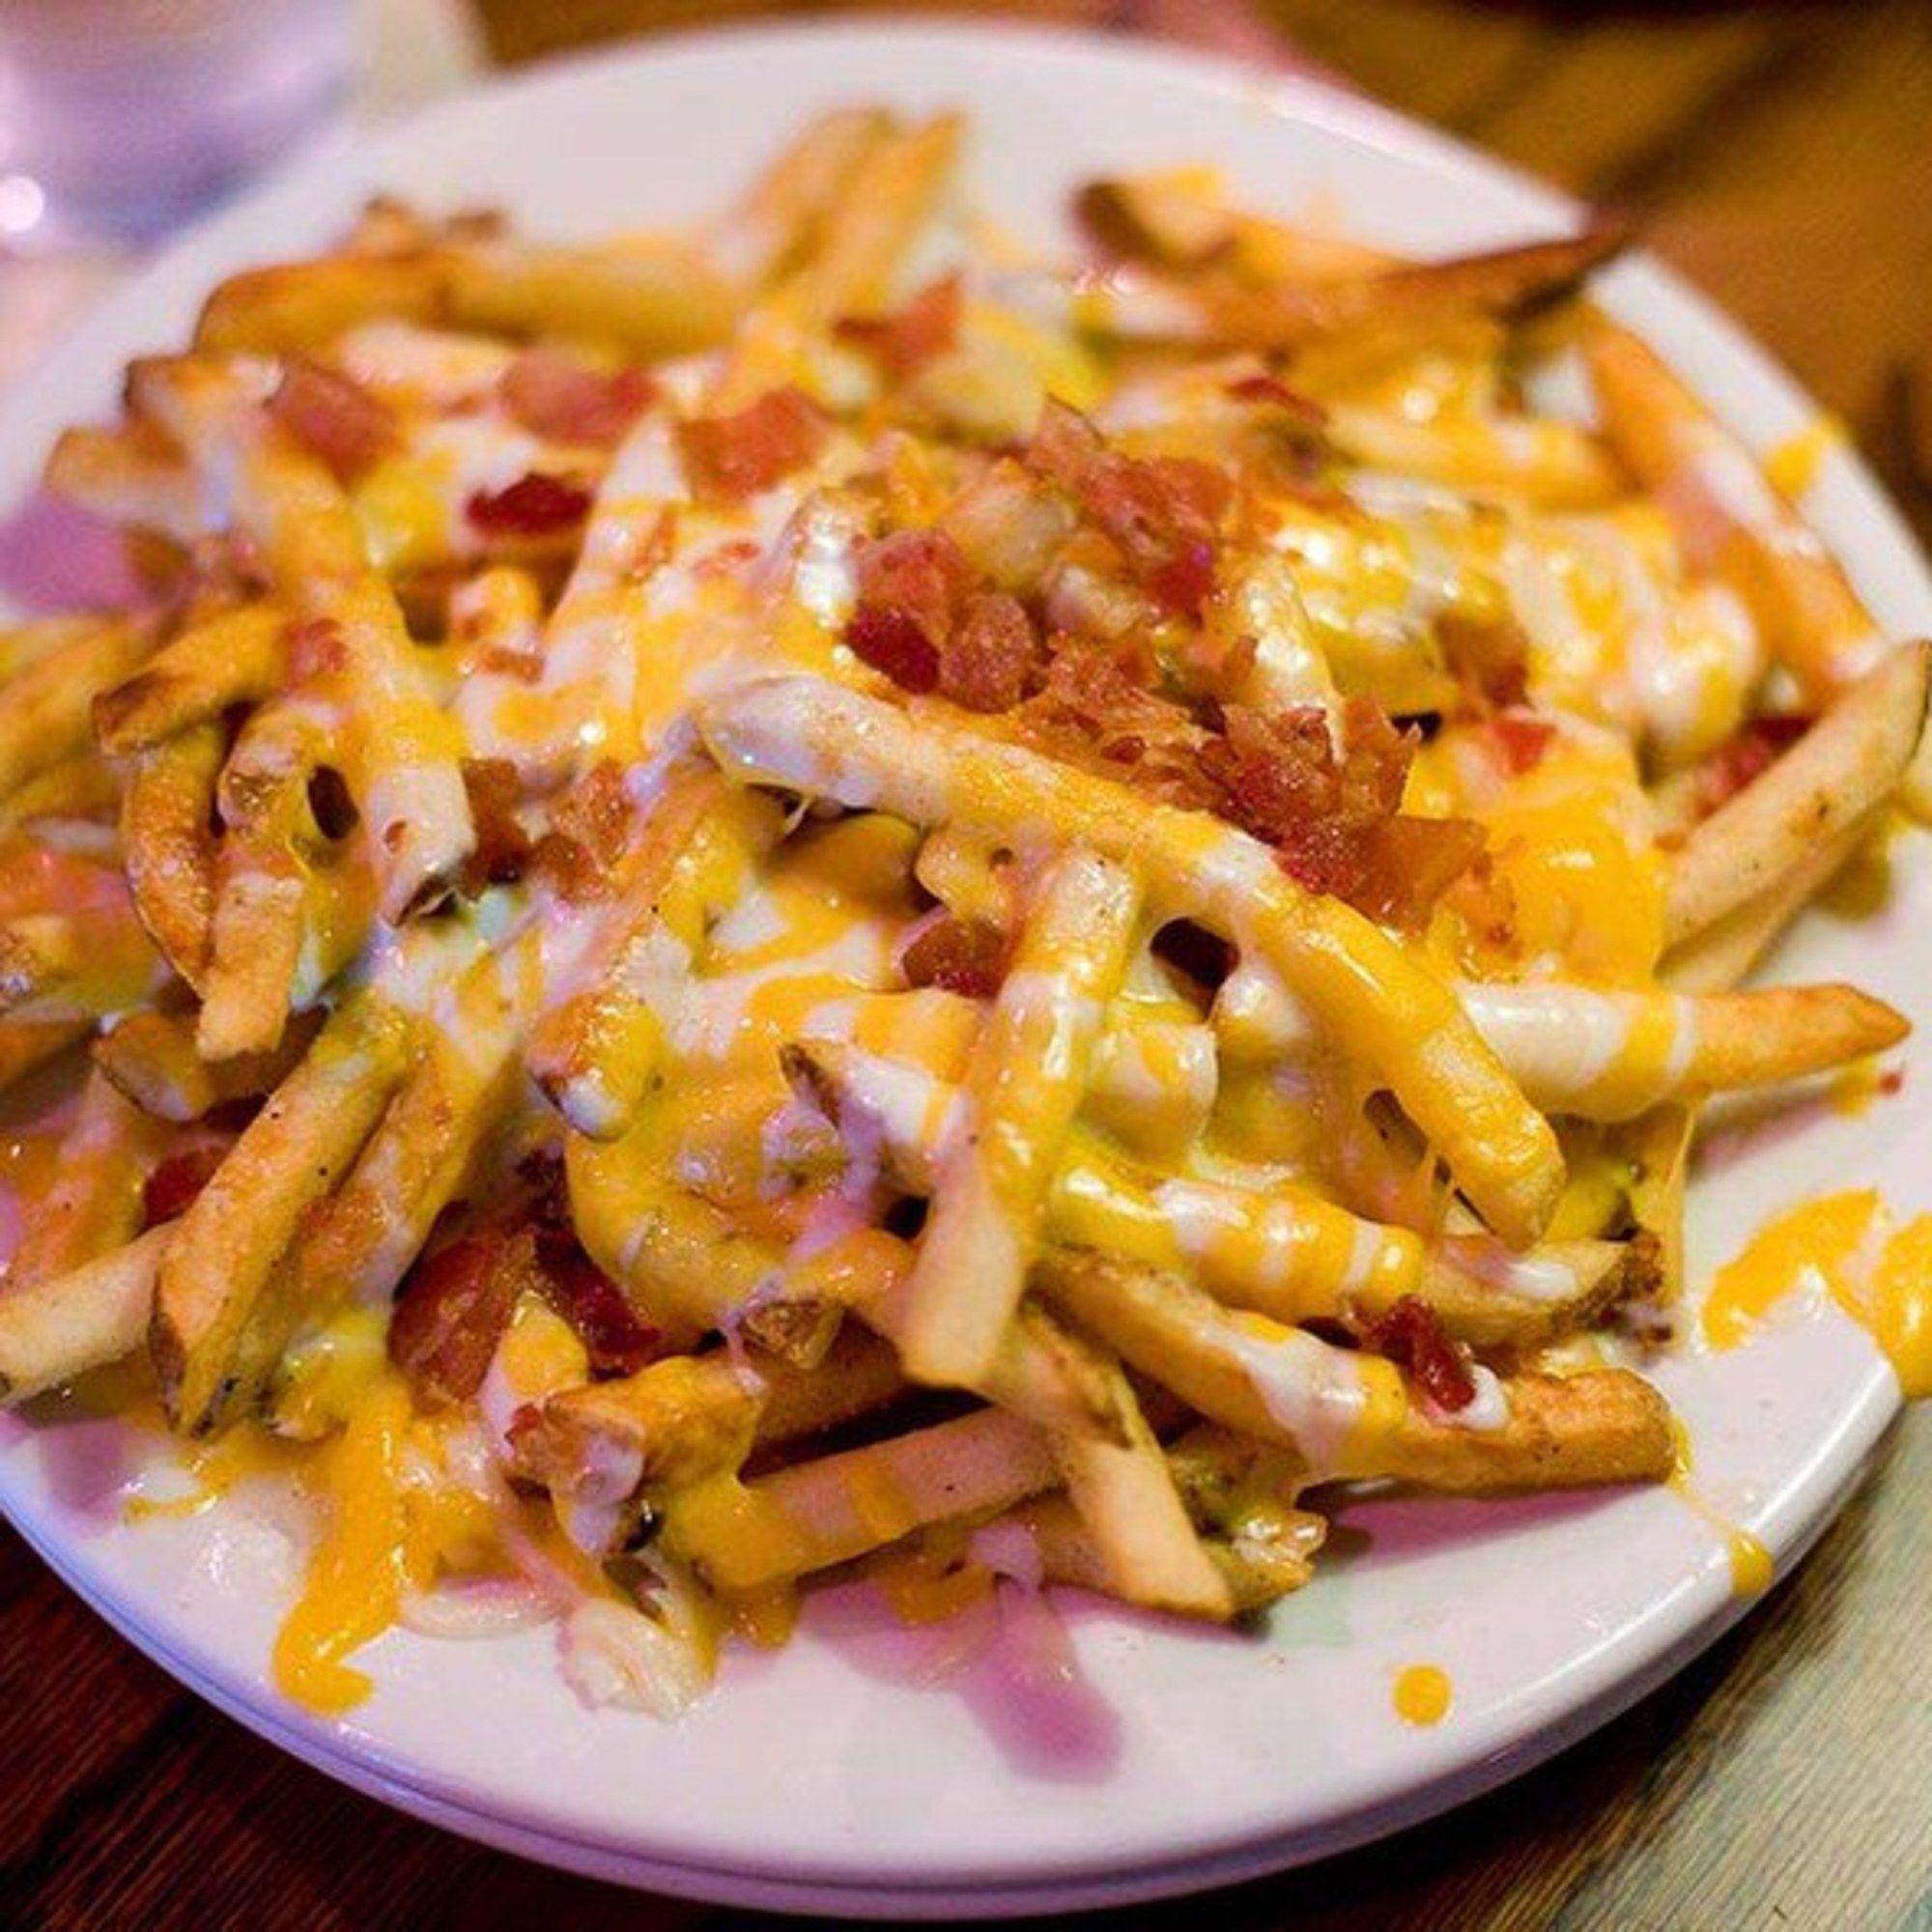 Taste Just Like Outback Steakhouse Aussie Fries Recipe Aussie Fries Cheese Fries Recipes